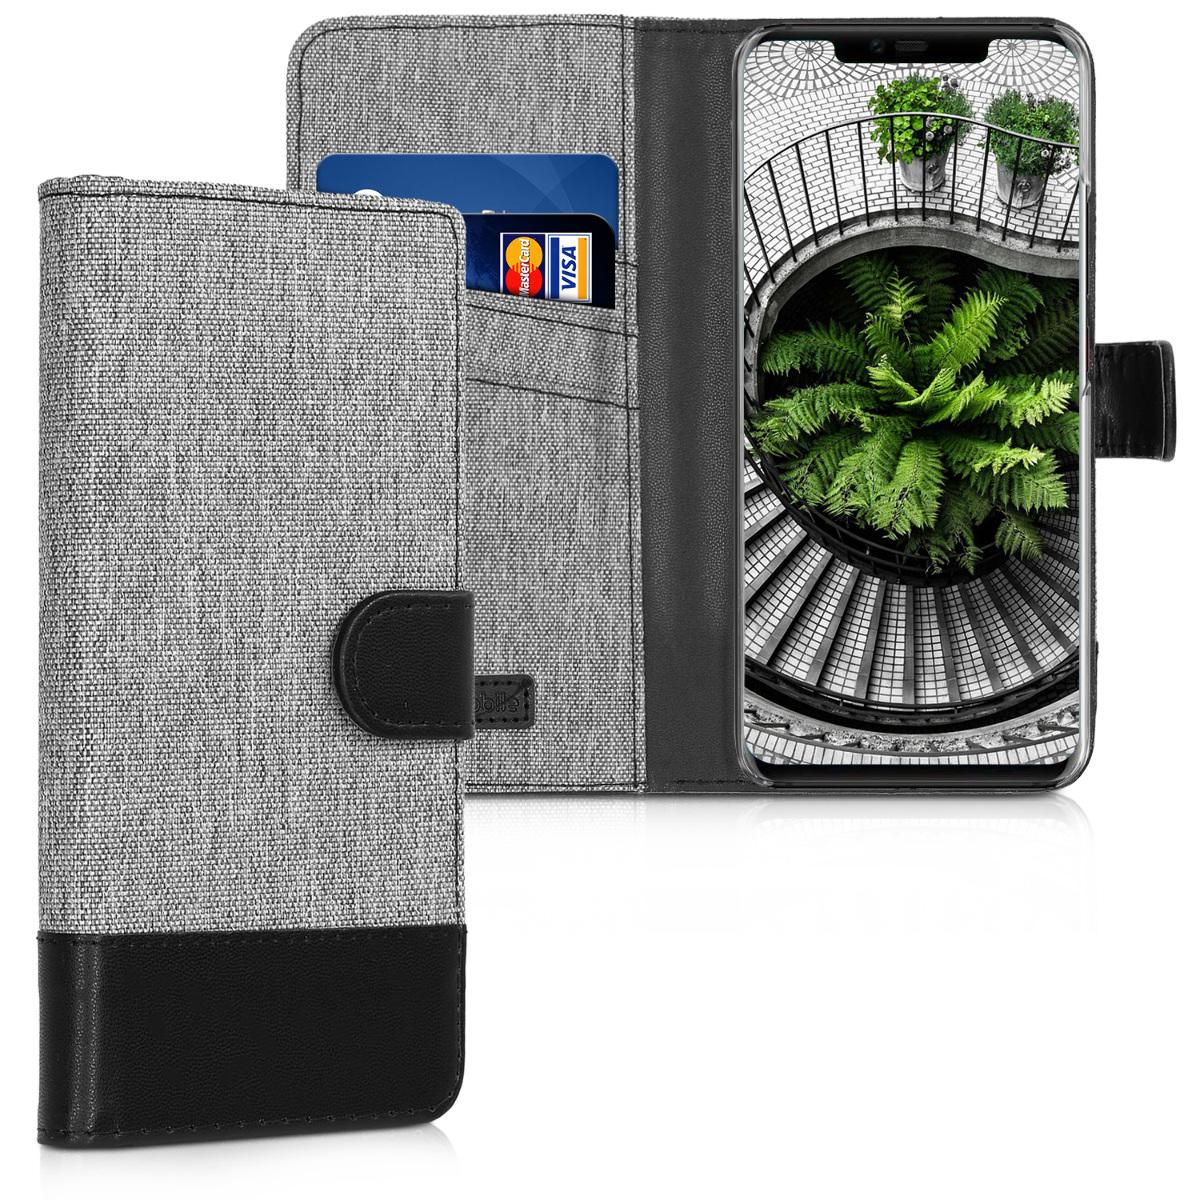 KW Θήκη Πορτοφόλι Huawei Mate 20 Pro - Συνθετικό Δέρμα - Grey / Black (46398.01)